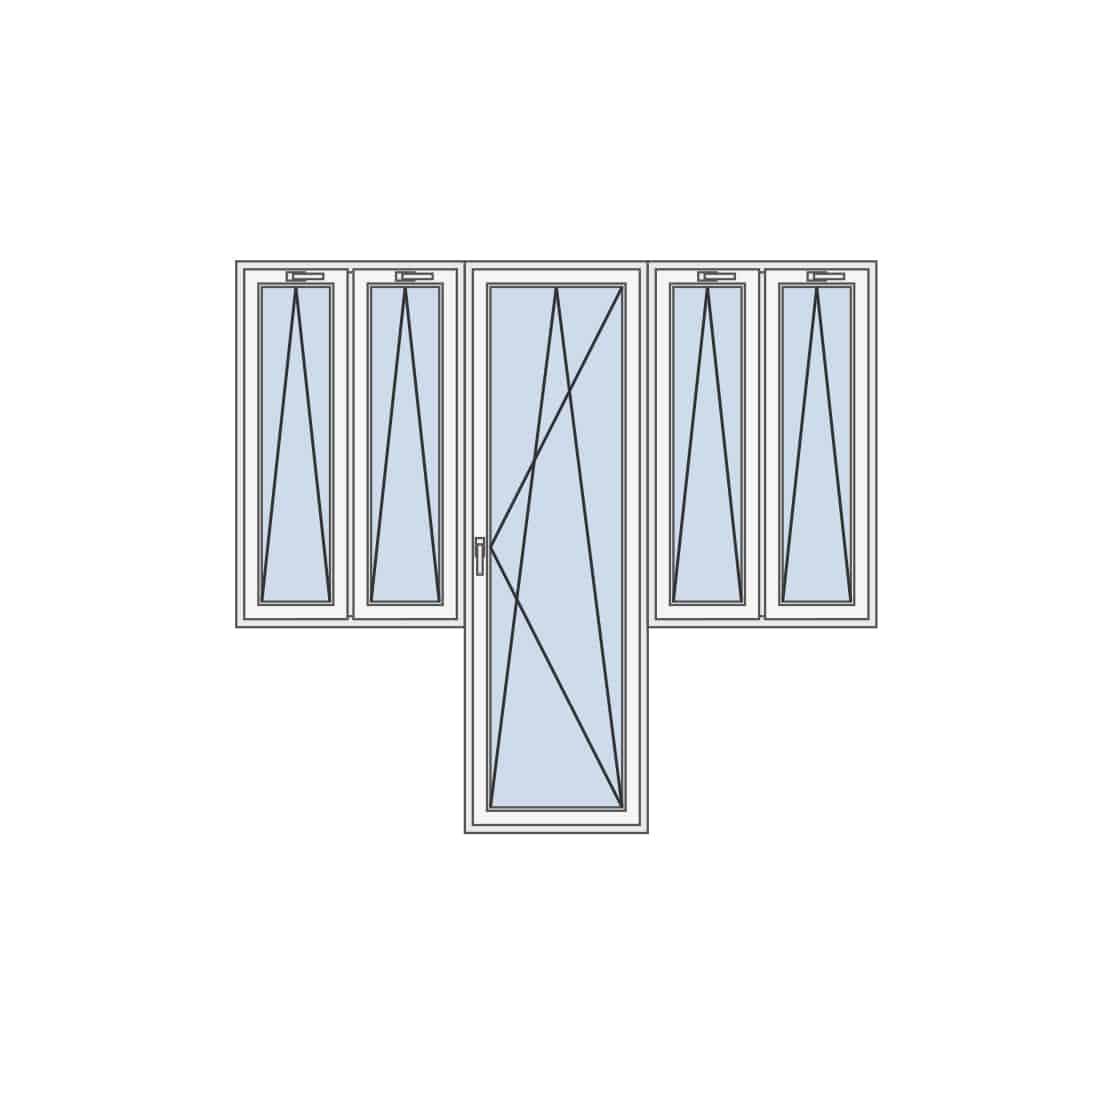 Balkonska vrata sa kombinacijom